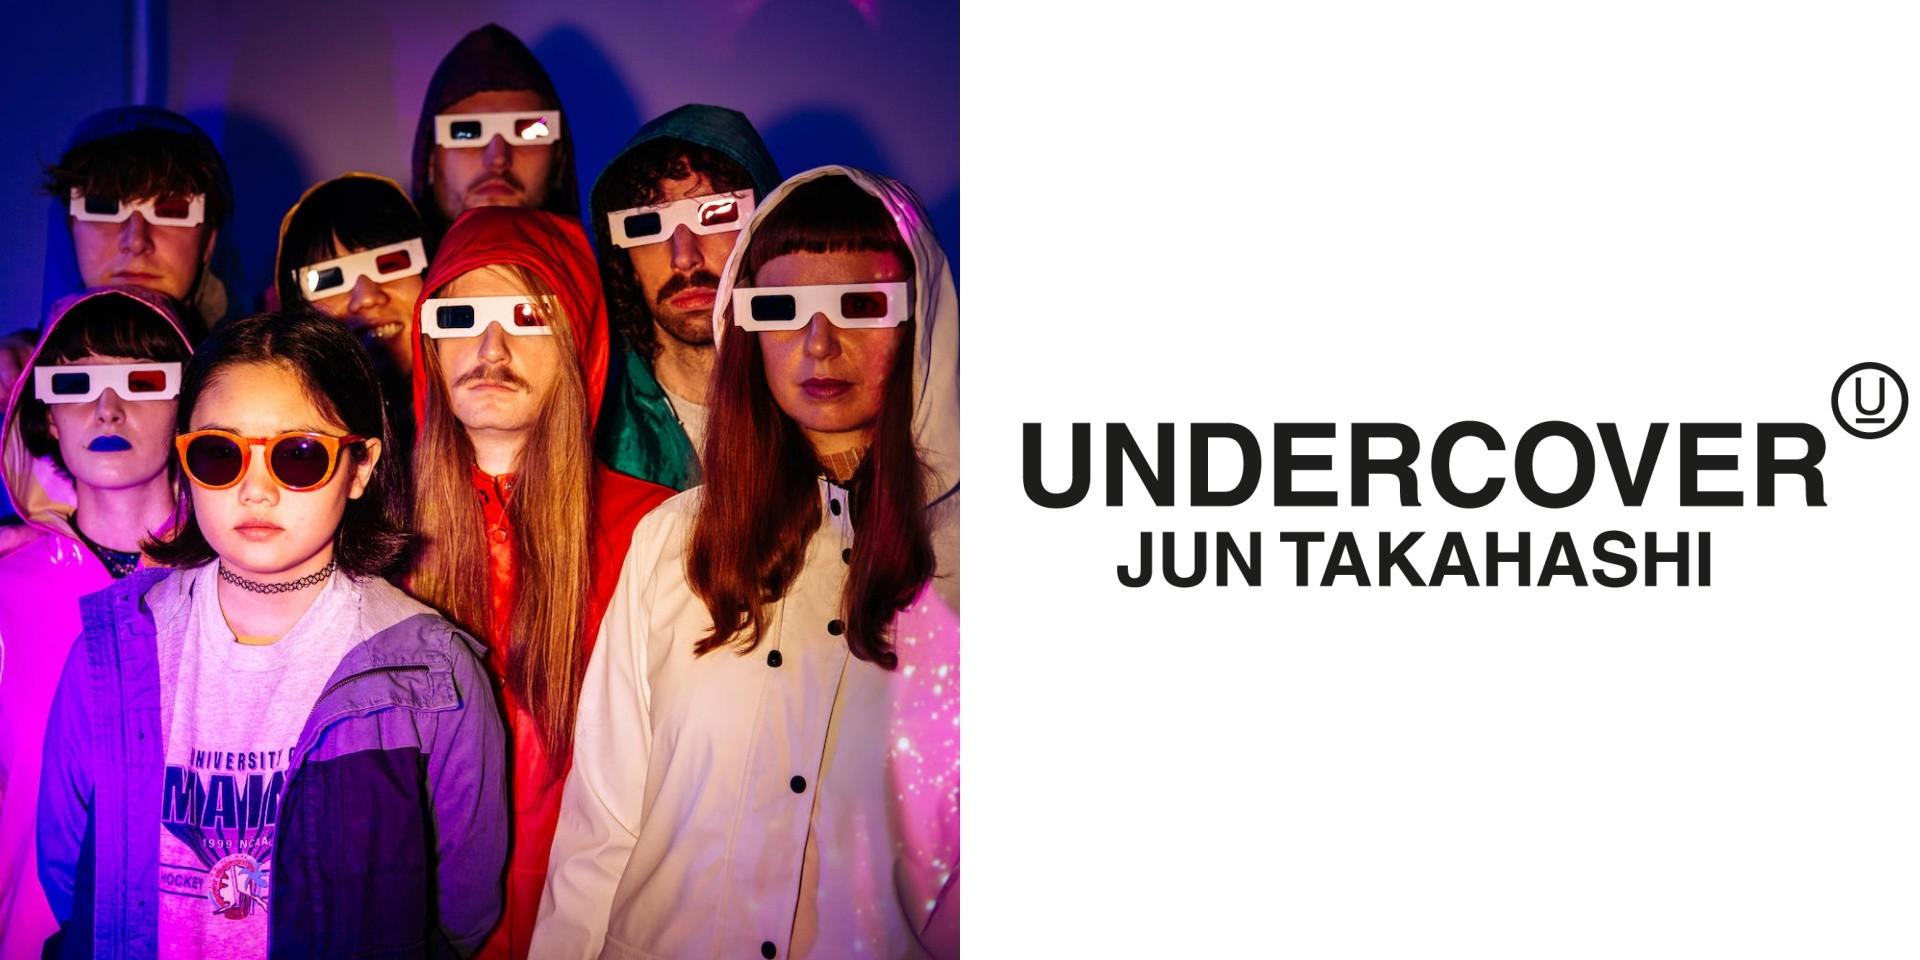 Superorganism x UNDERCOVER announces limited edition merchandise